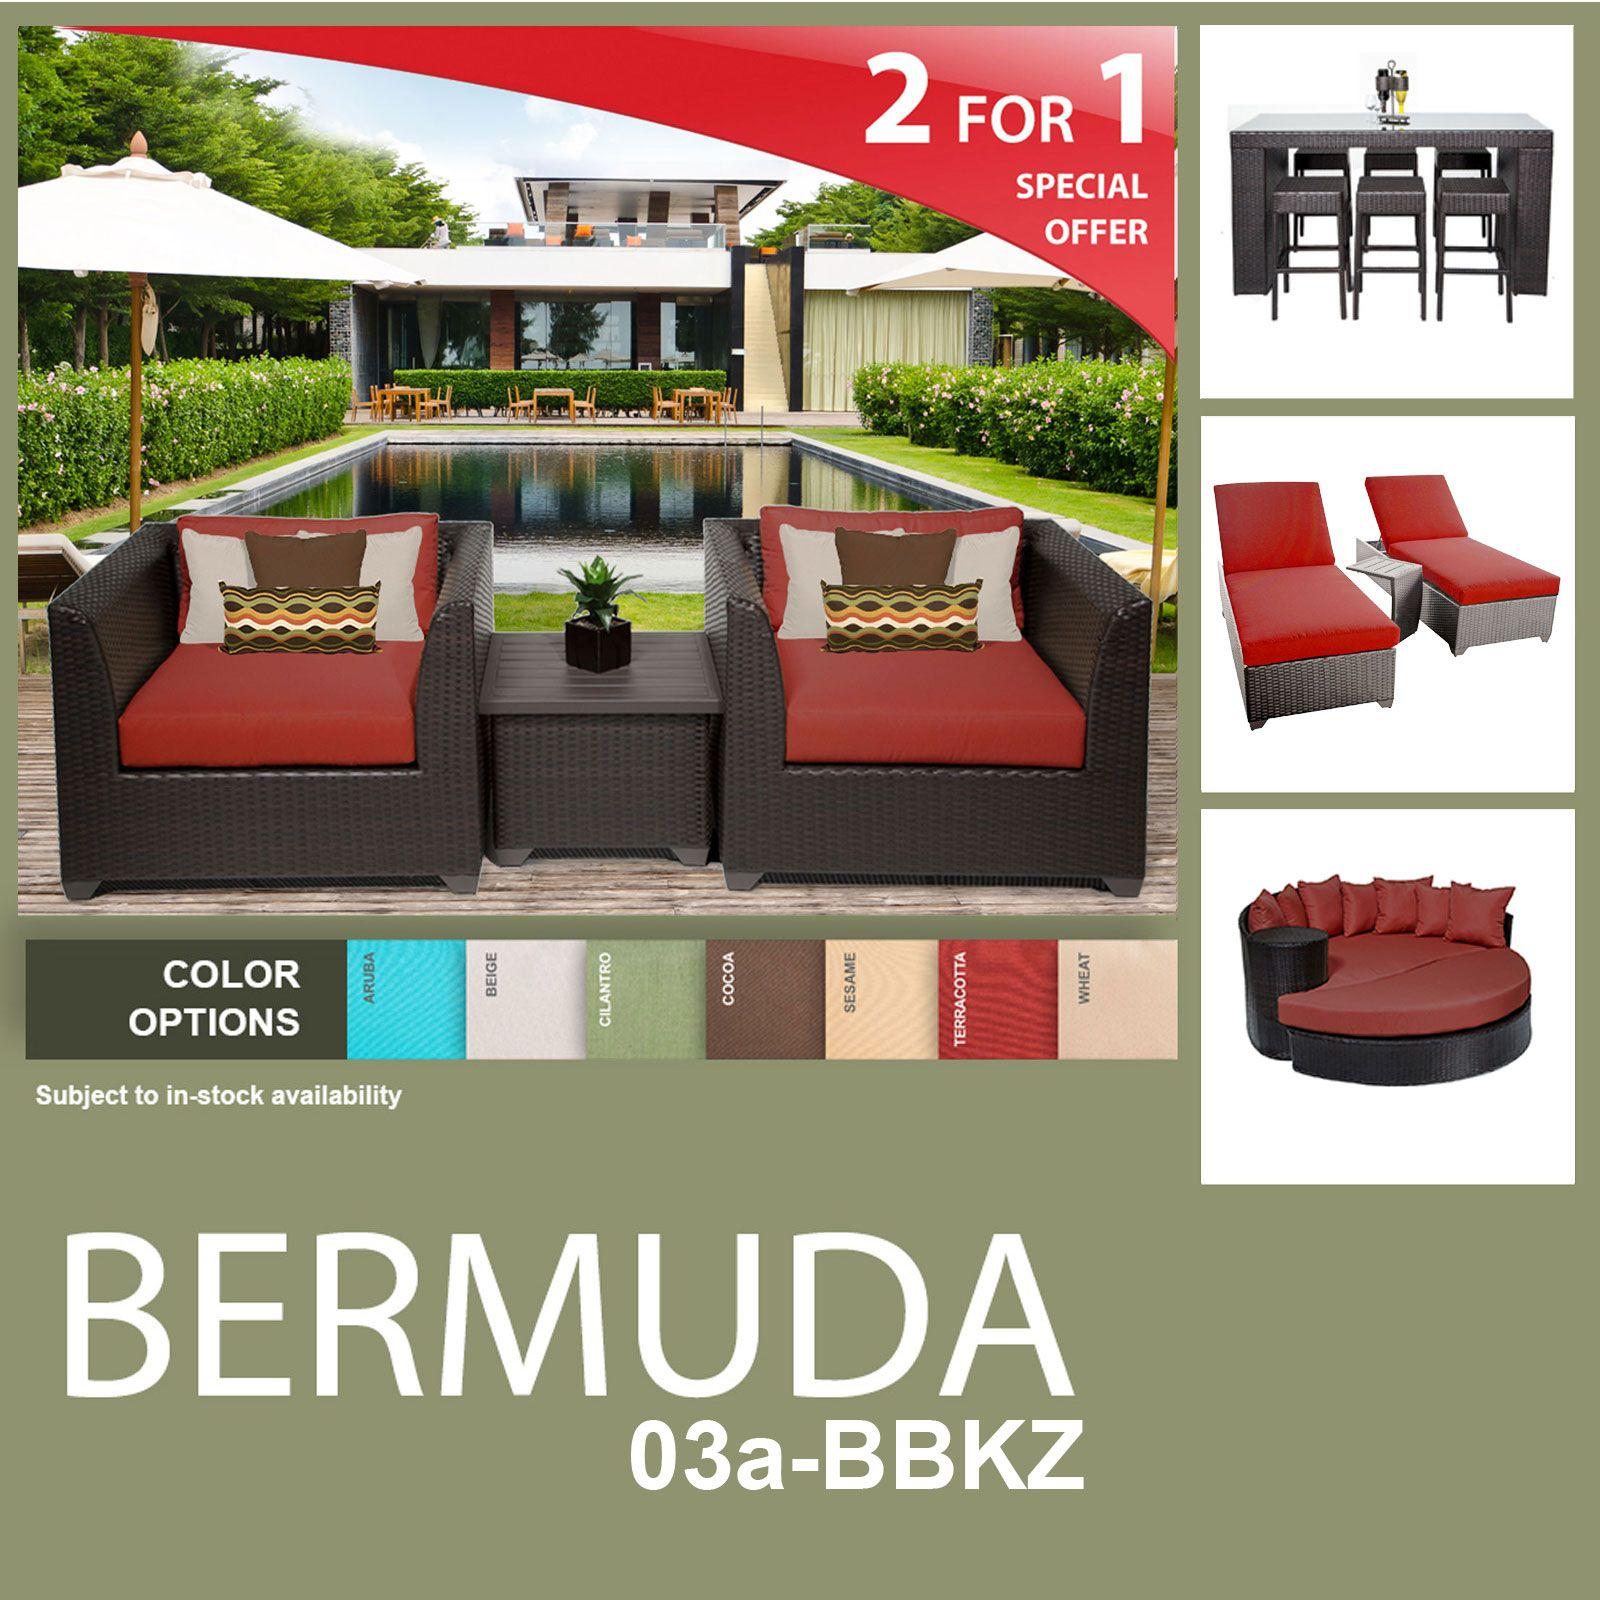 Bermuda 15 Piece Outdoor Wicker Patio Furniture Package Bermuda